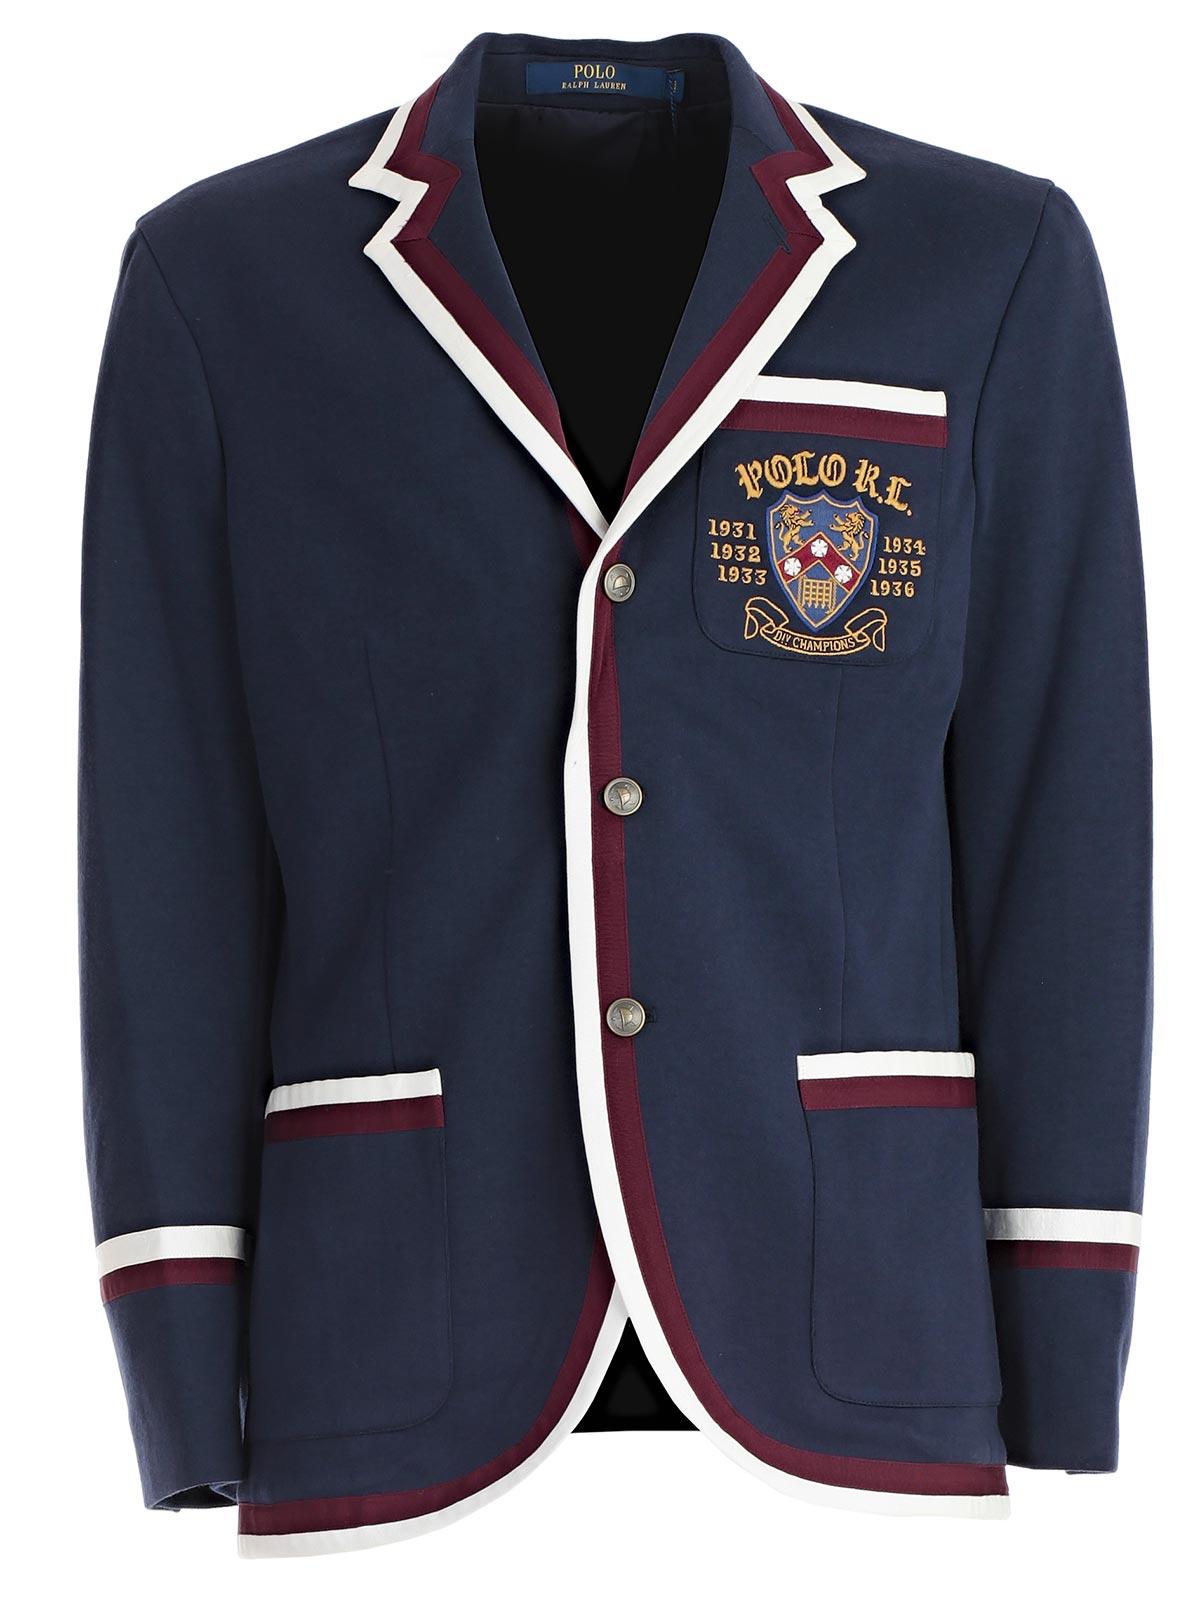 Picture of Polo Ralph Lauren Jacket